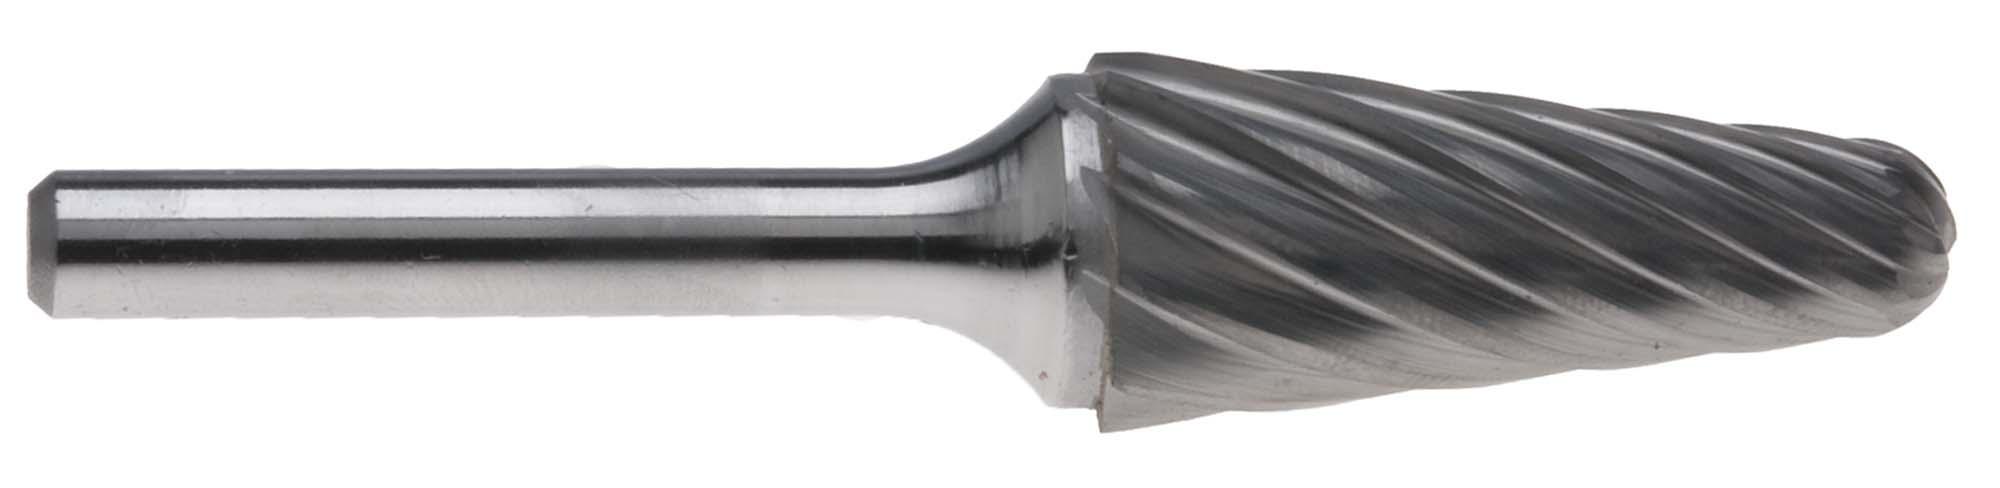 "3/4"" Style L Taper Shape with Radius End 1/4"" Shank Carbide Burr for Aluminum SL-7AL"